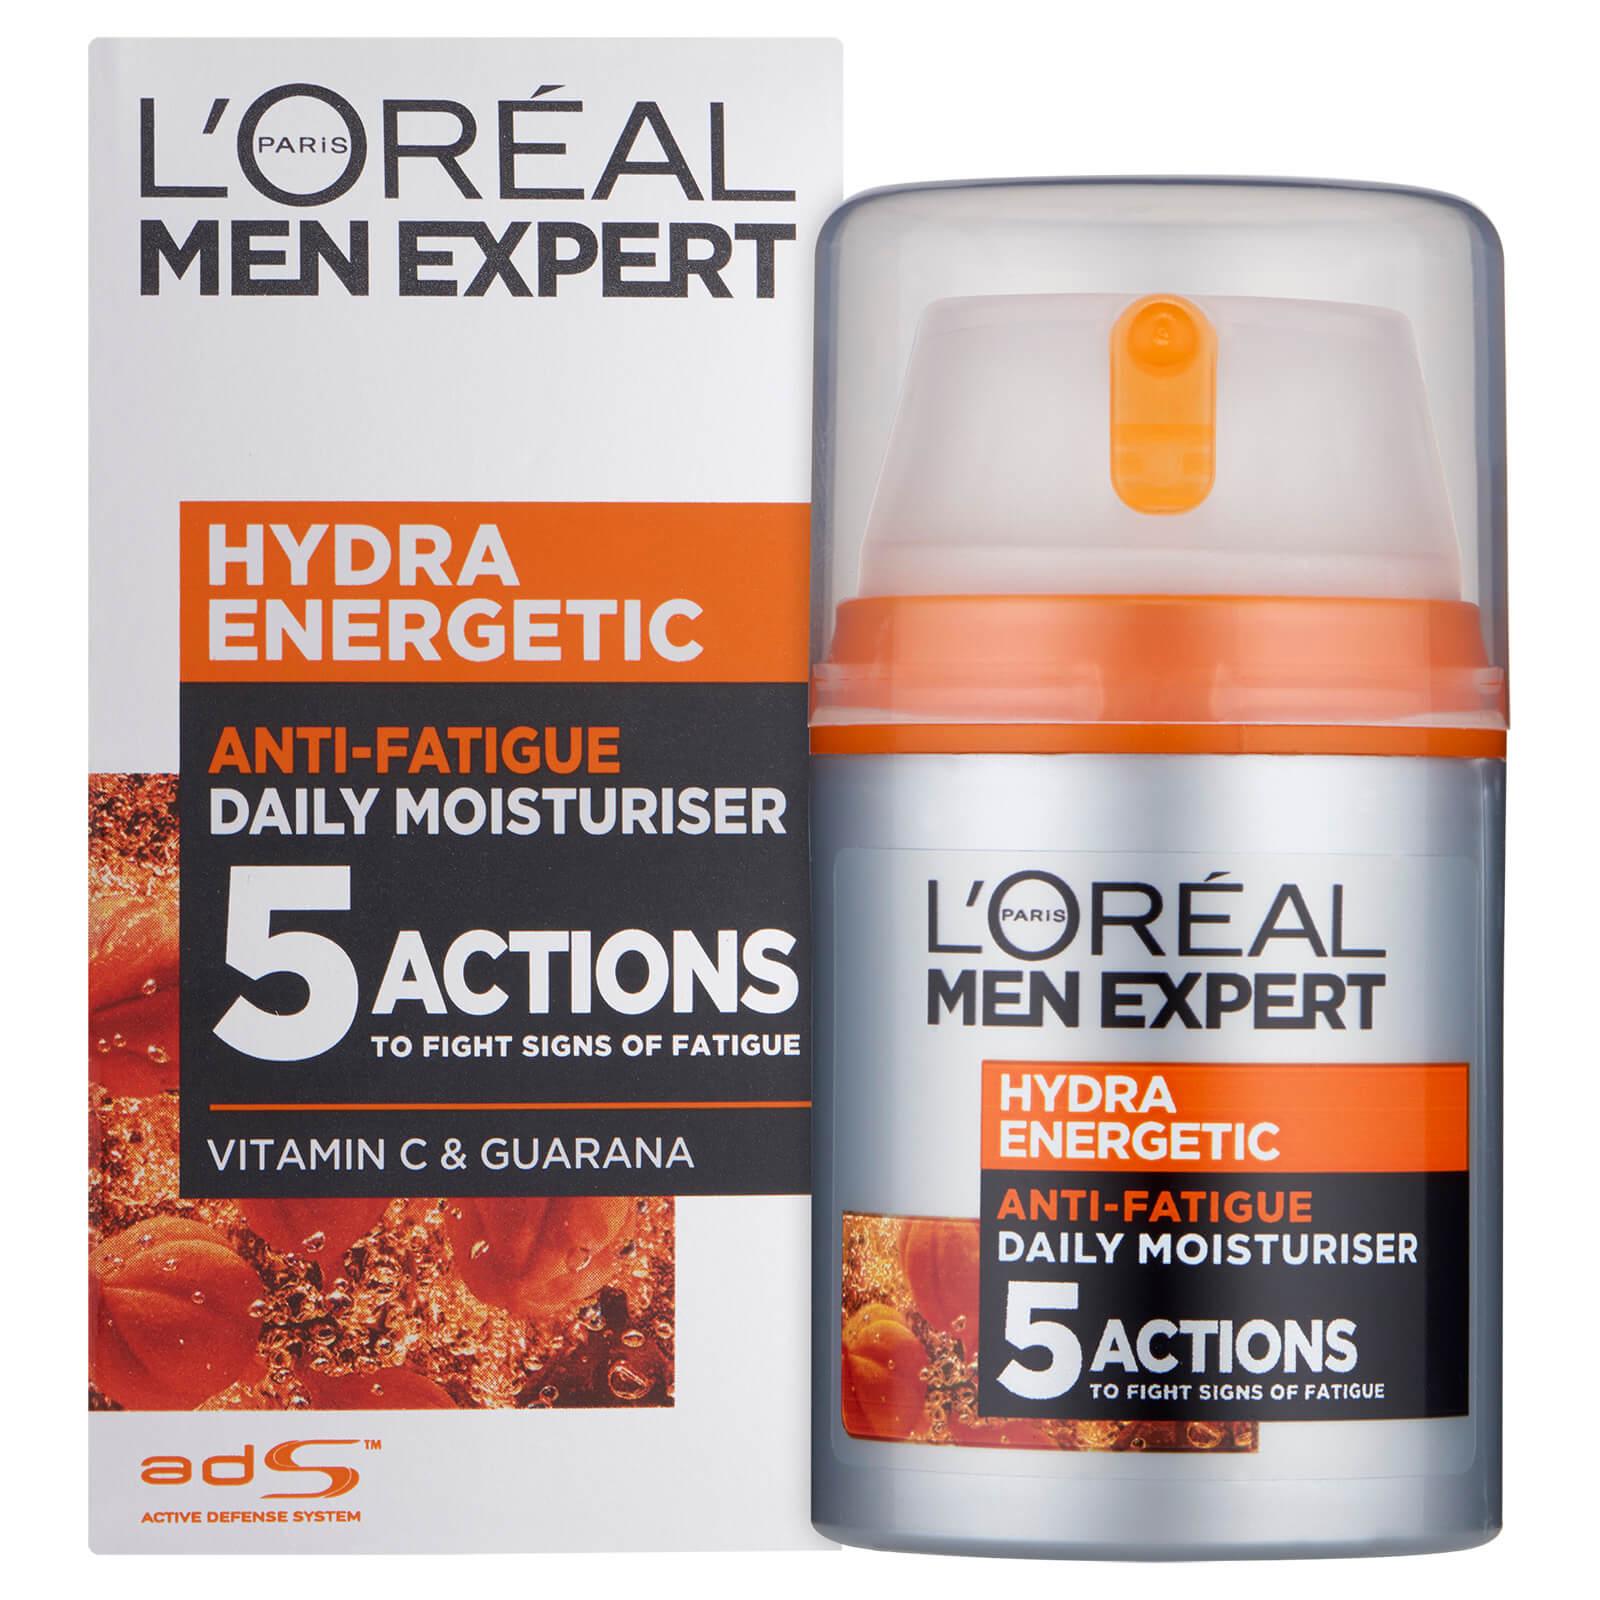 L'Oréal Men Expert Hydra Energetic Daily Anti Fatigue Moisturising Lotion (50 ml)